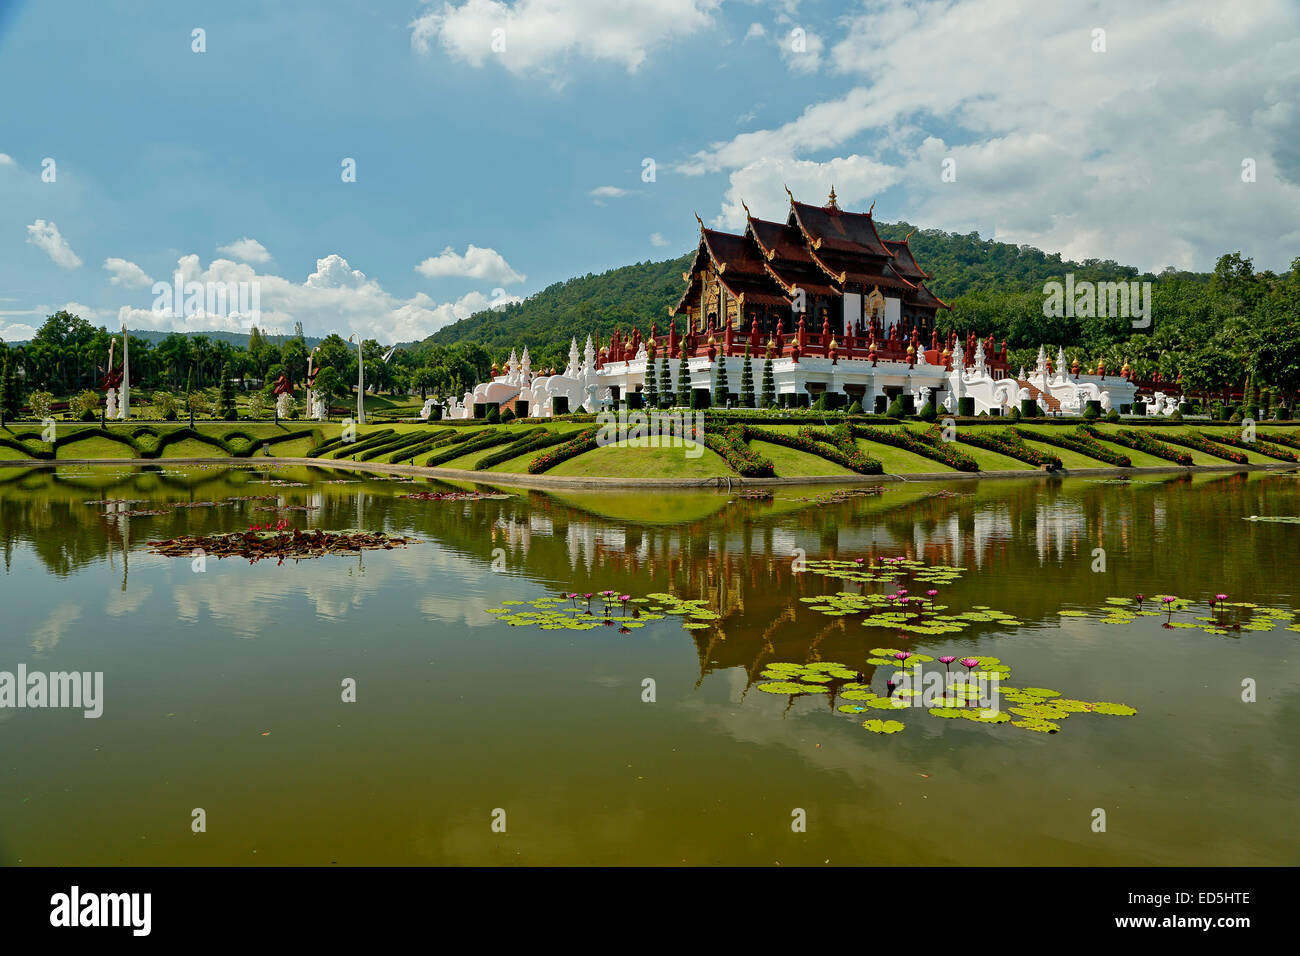 Royal Pavillon reflektiert auf Teich mit Seerosen, Royal Park Rajapruek, Chiang Mai, Thailand Stockbild